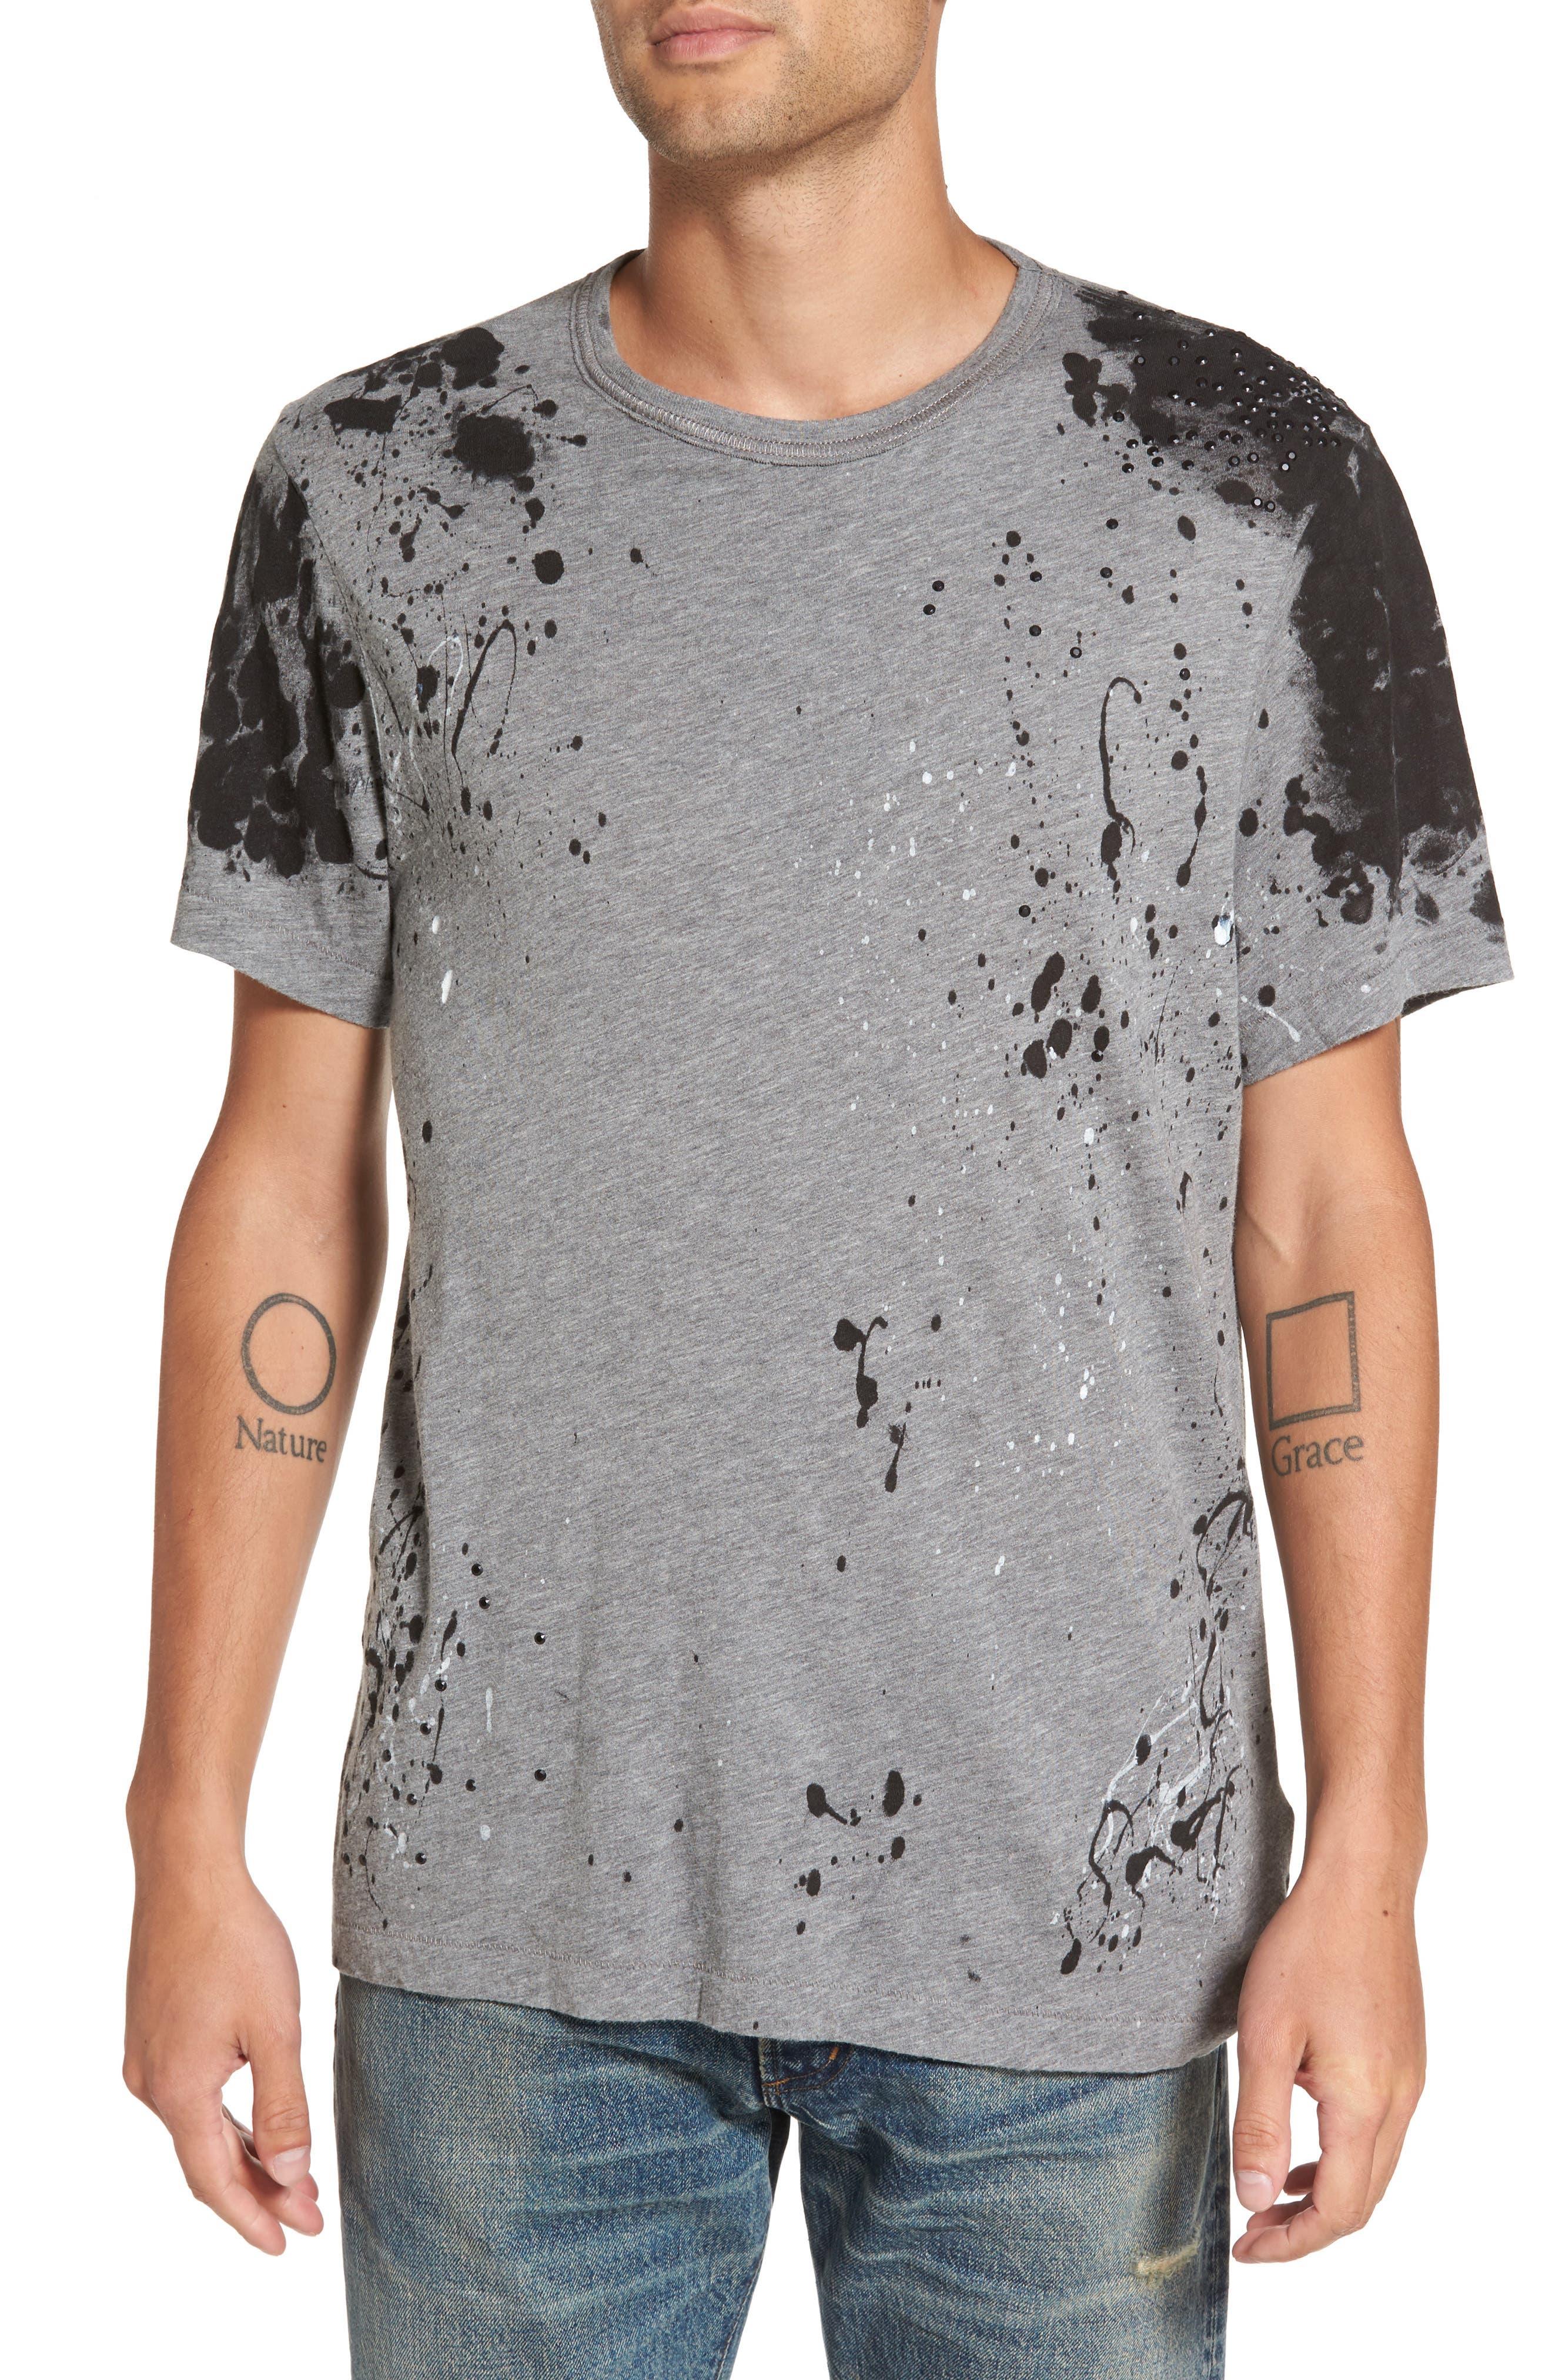 True Religion Brand Jeans Embellished Splatter Print T-Shirt